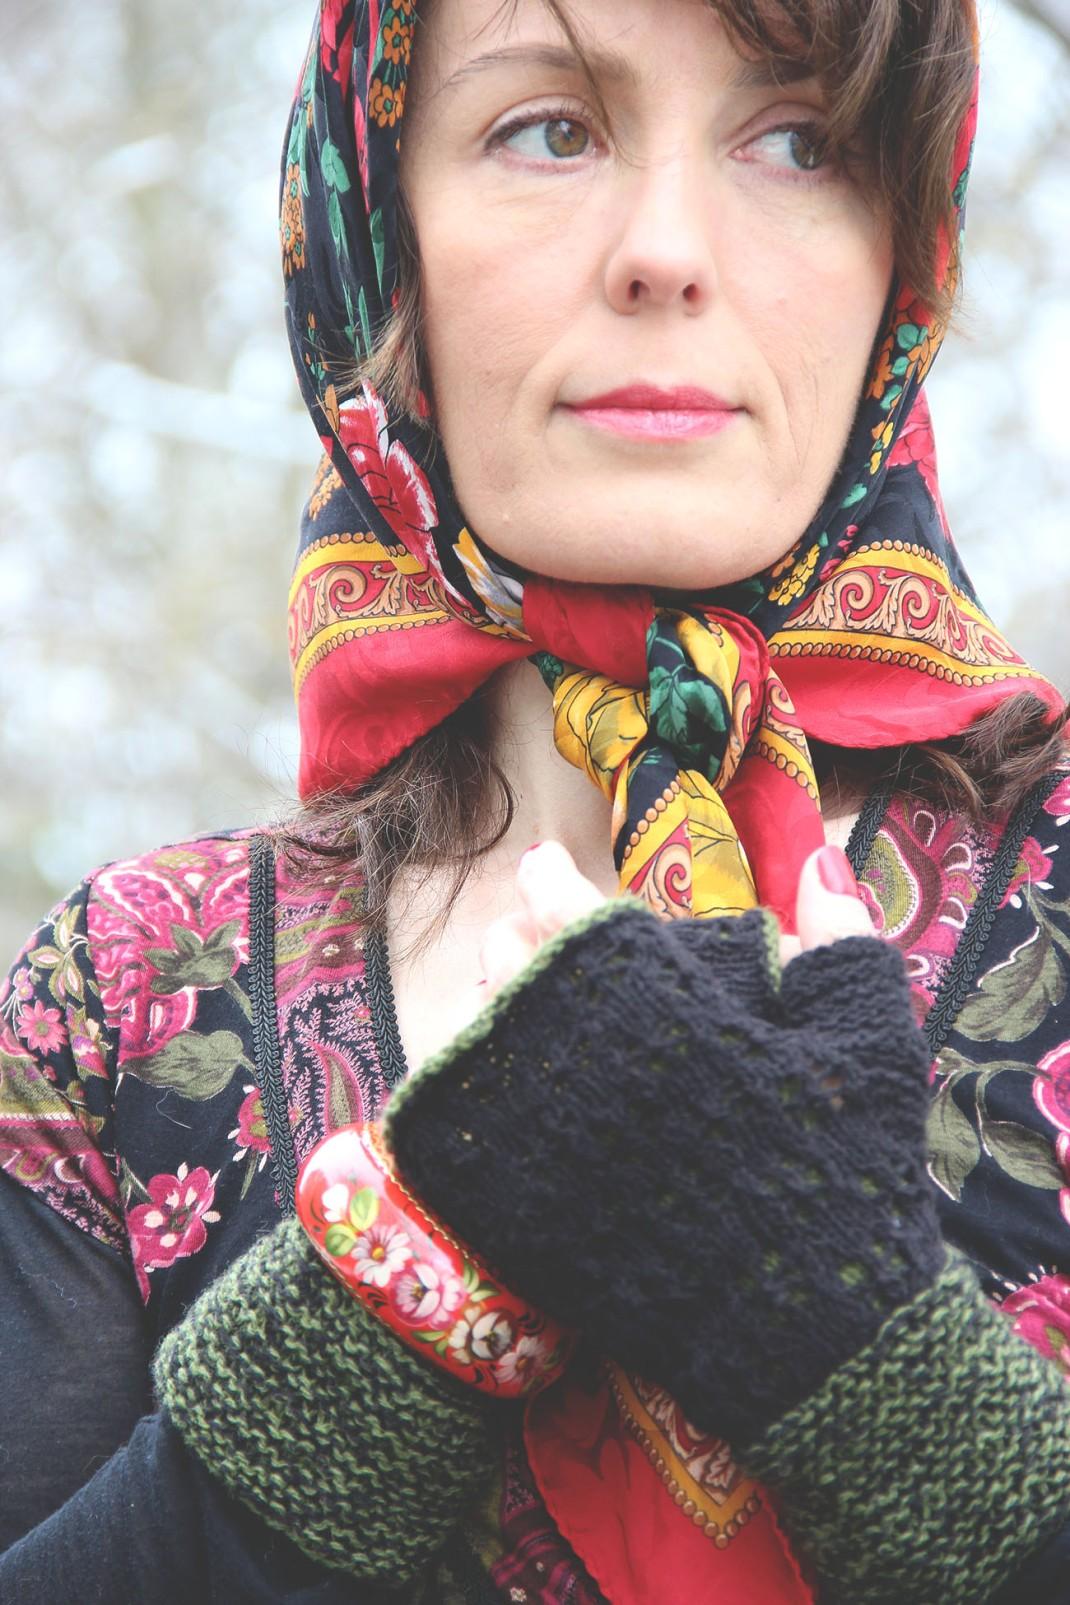 KAL mitaines reflets Elise Dupont PurPle Laines (11)